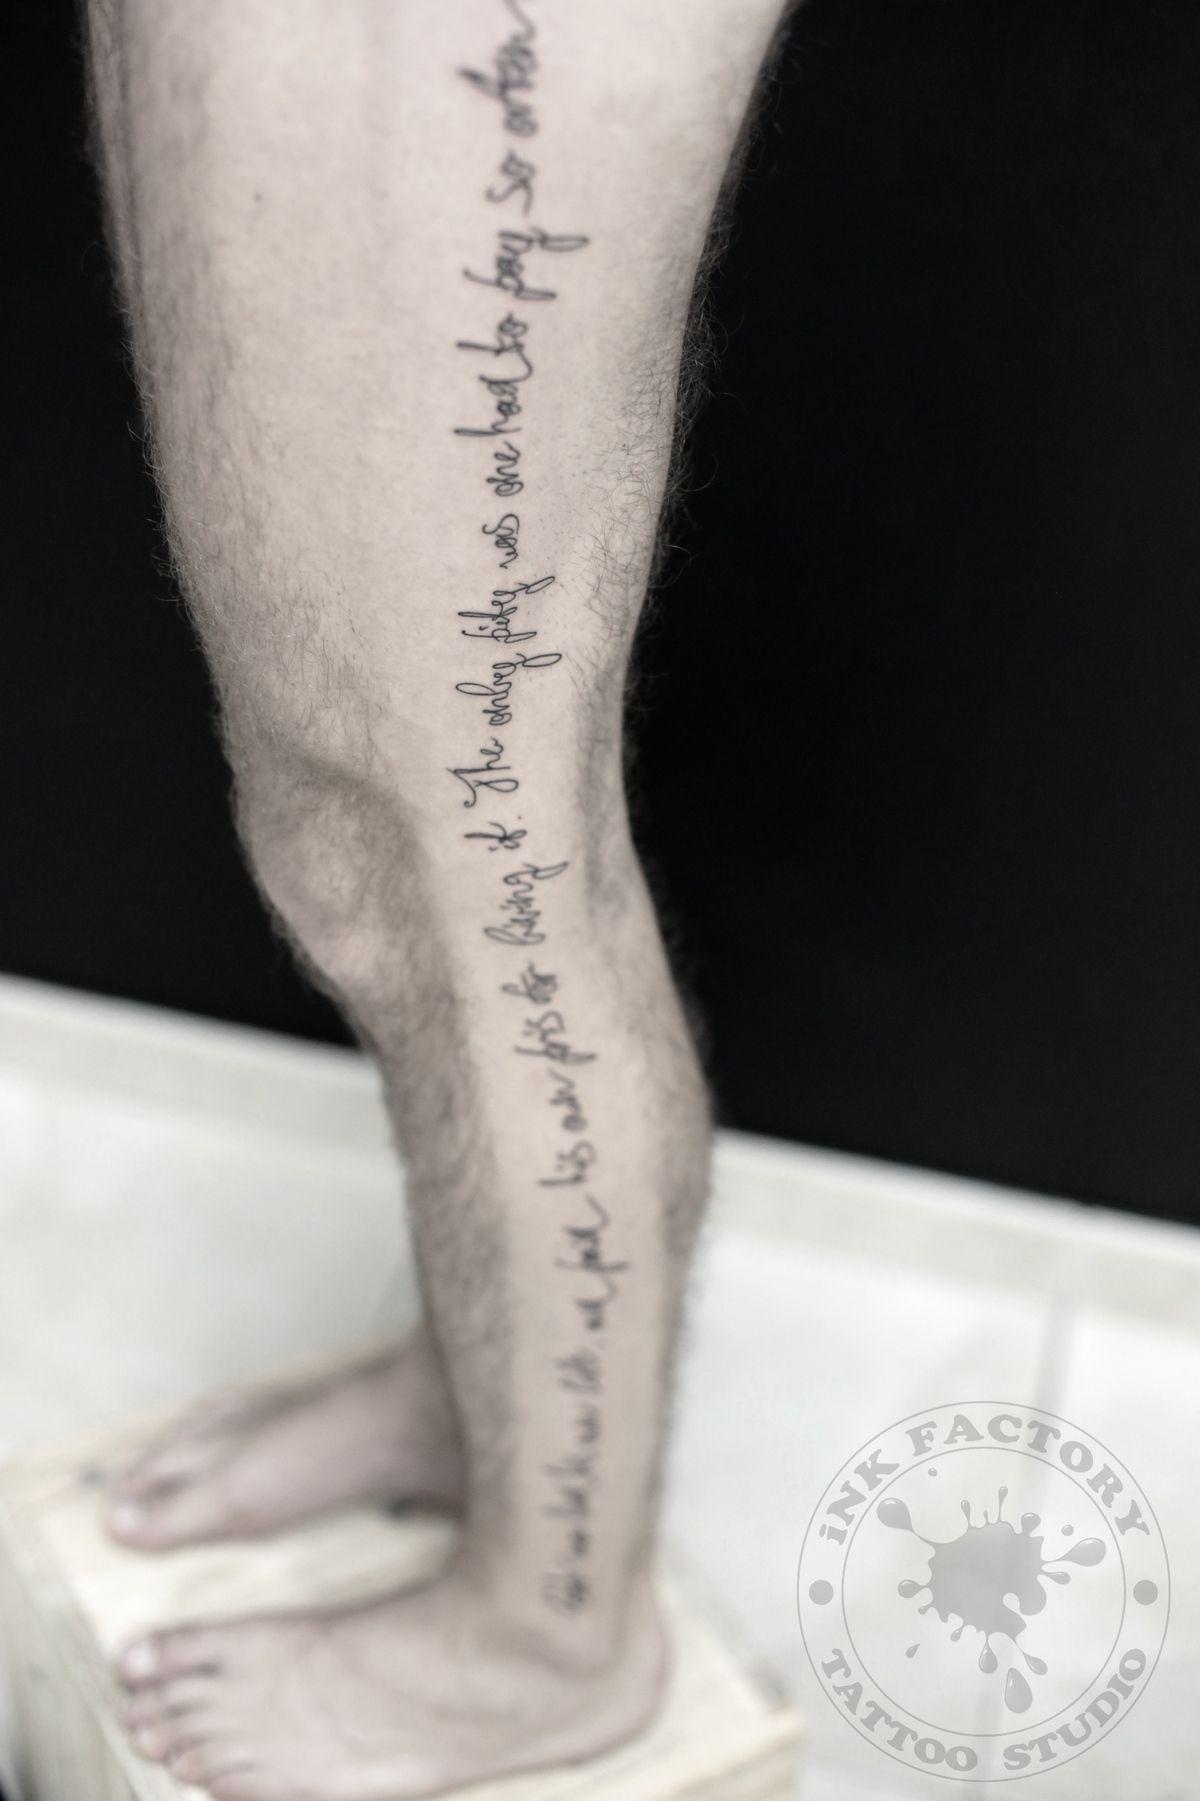 Надпись на все ногу